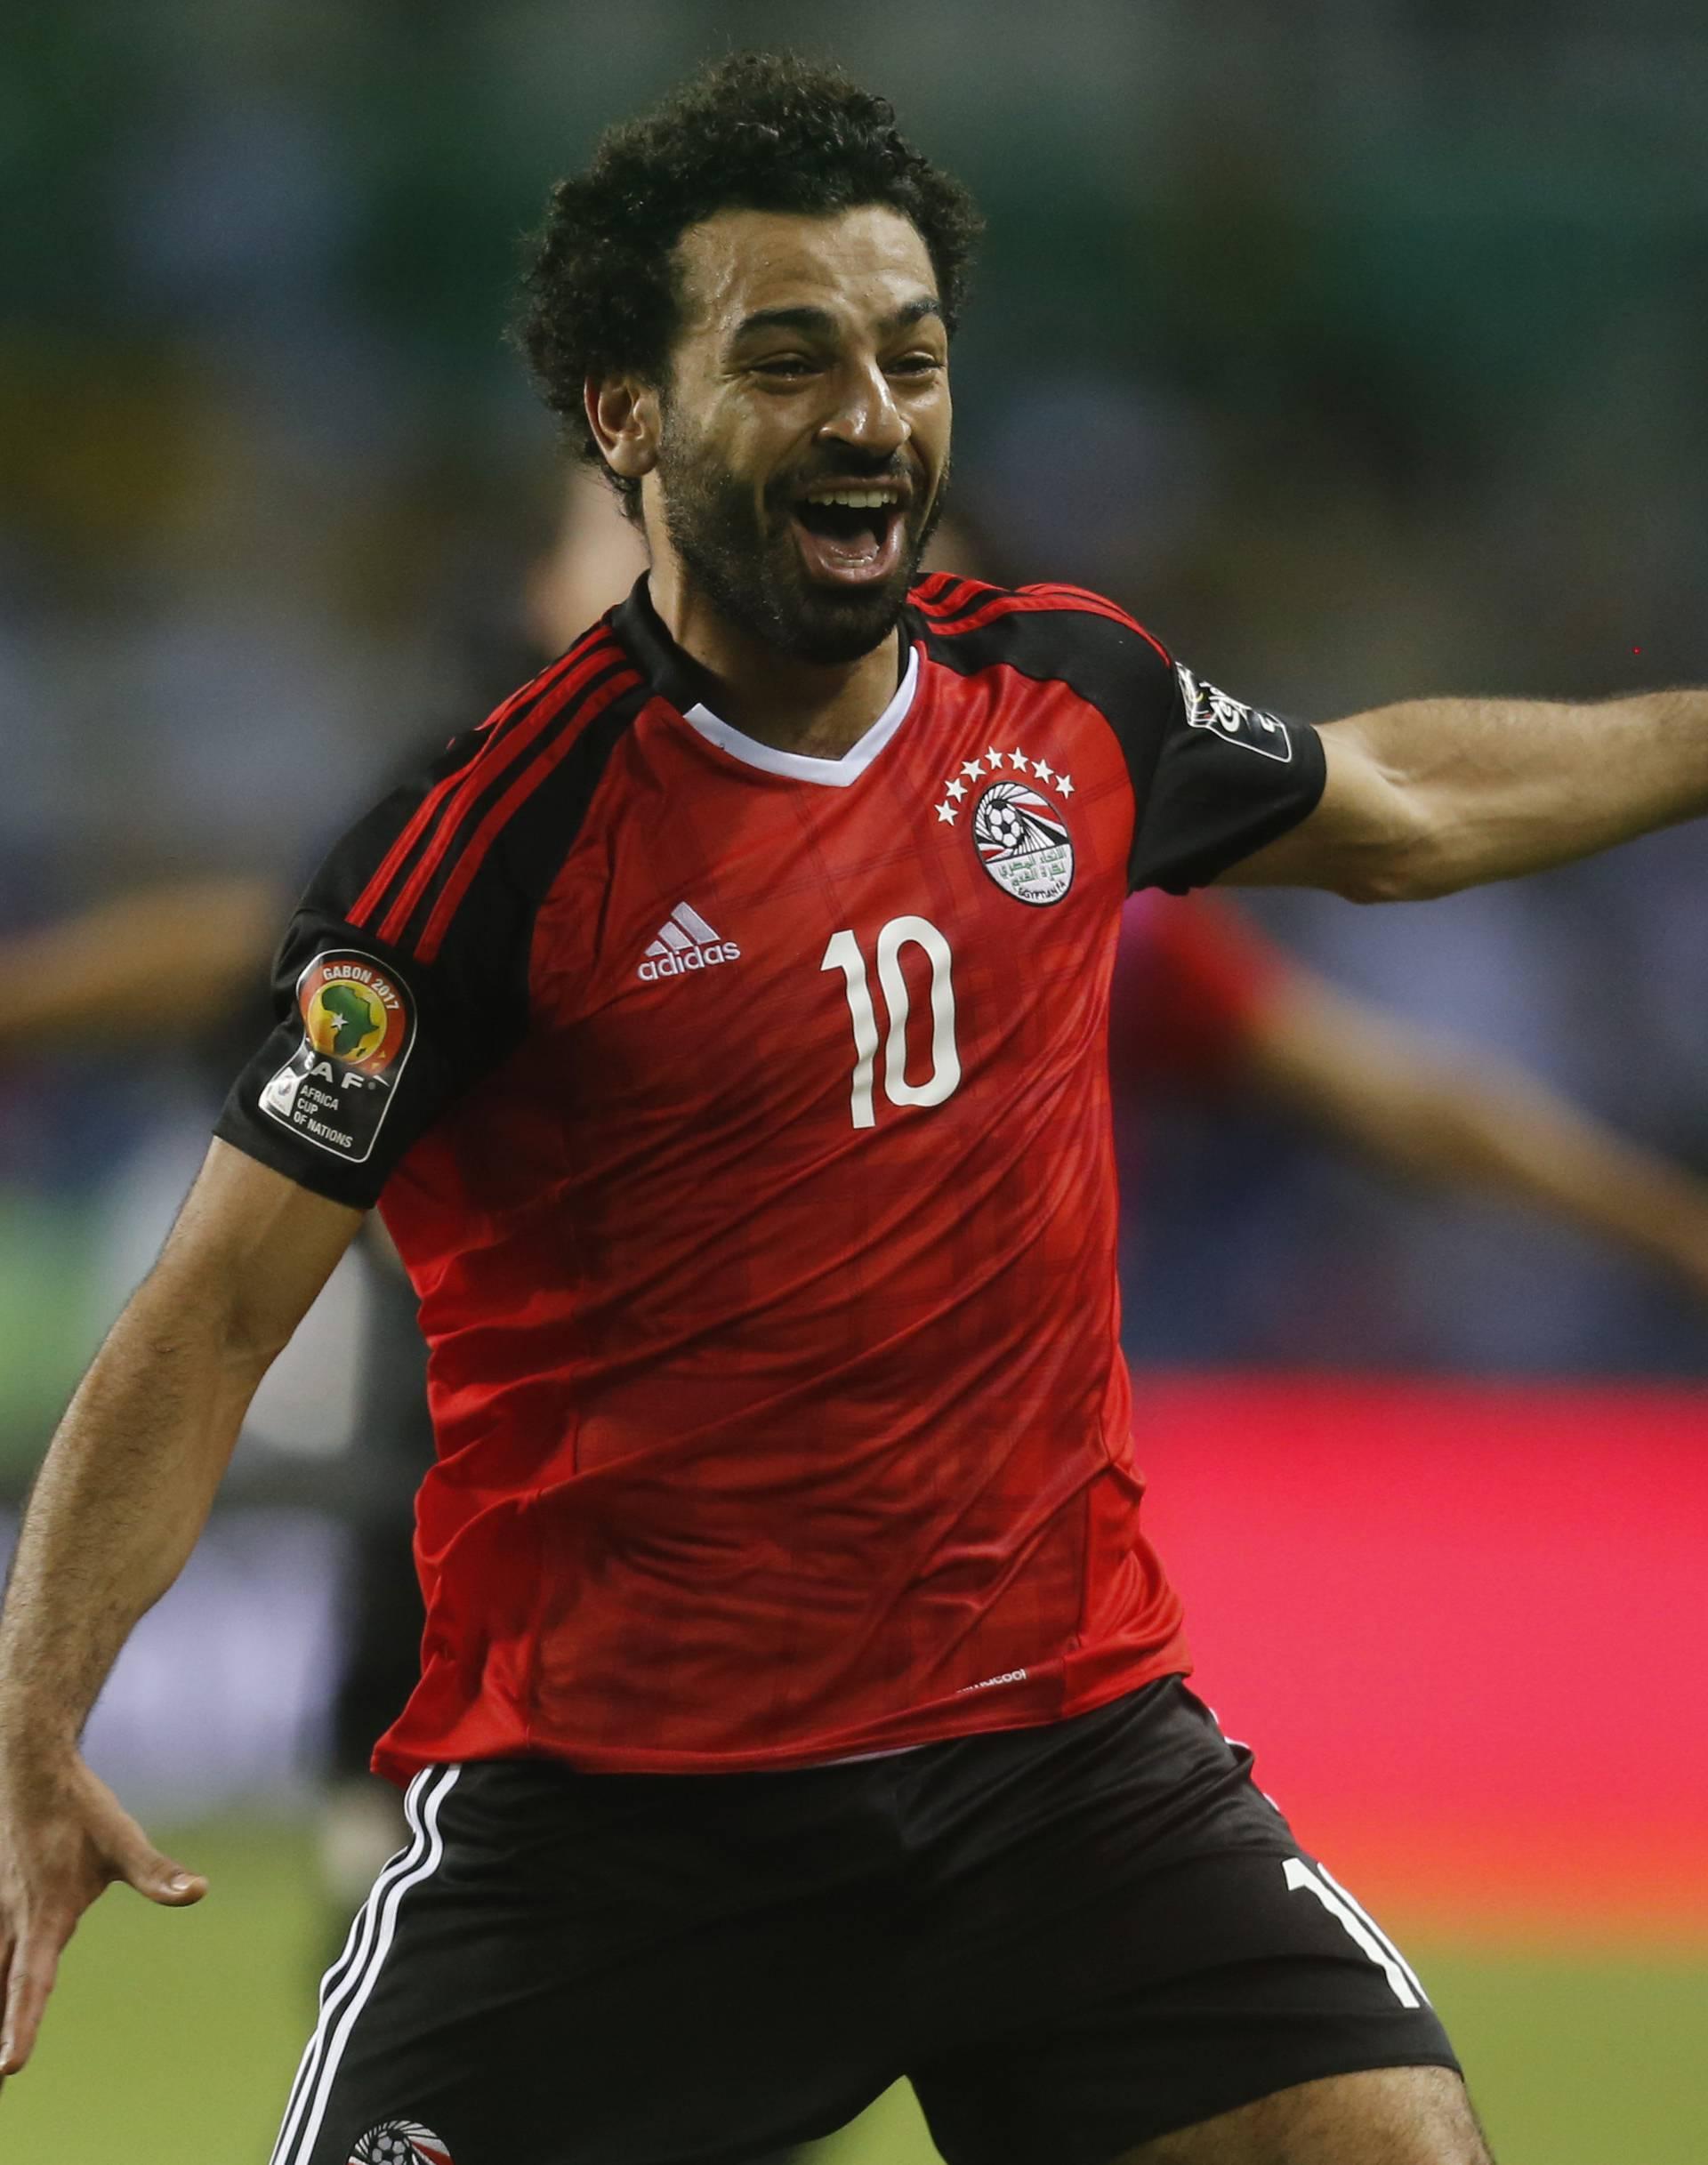 Egypt's Mohamed Salah celebrates after the game